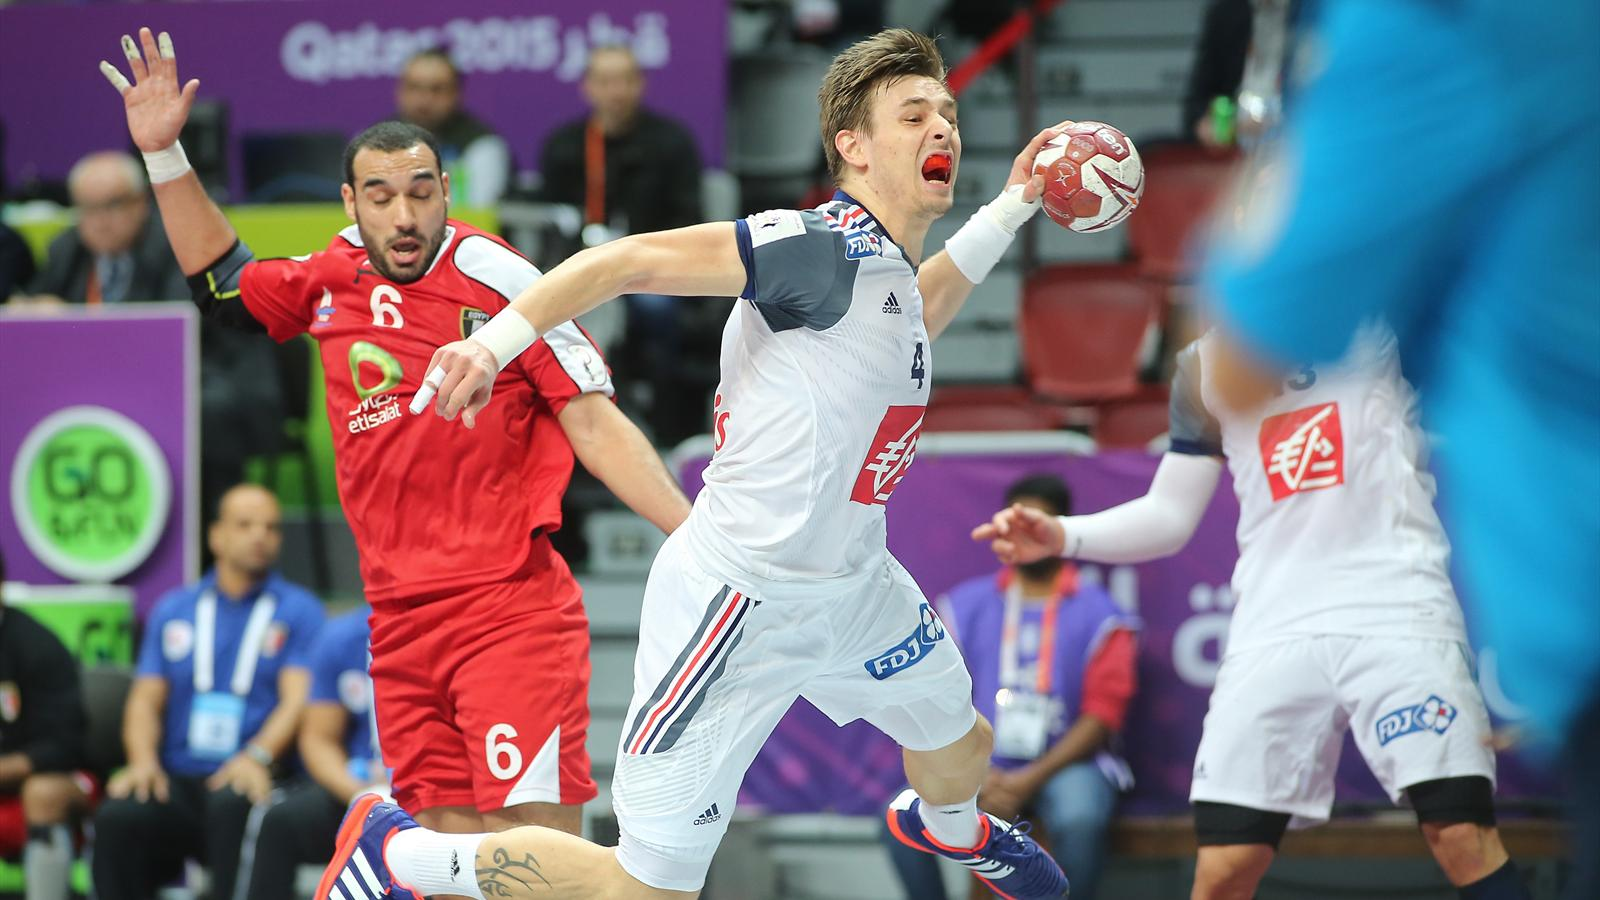 Handball mondial 2015 la france face la vieille connaissance islandaise championnat du - Coupe du monde 2015 handball ...